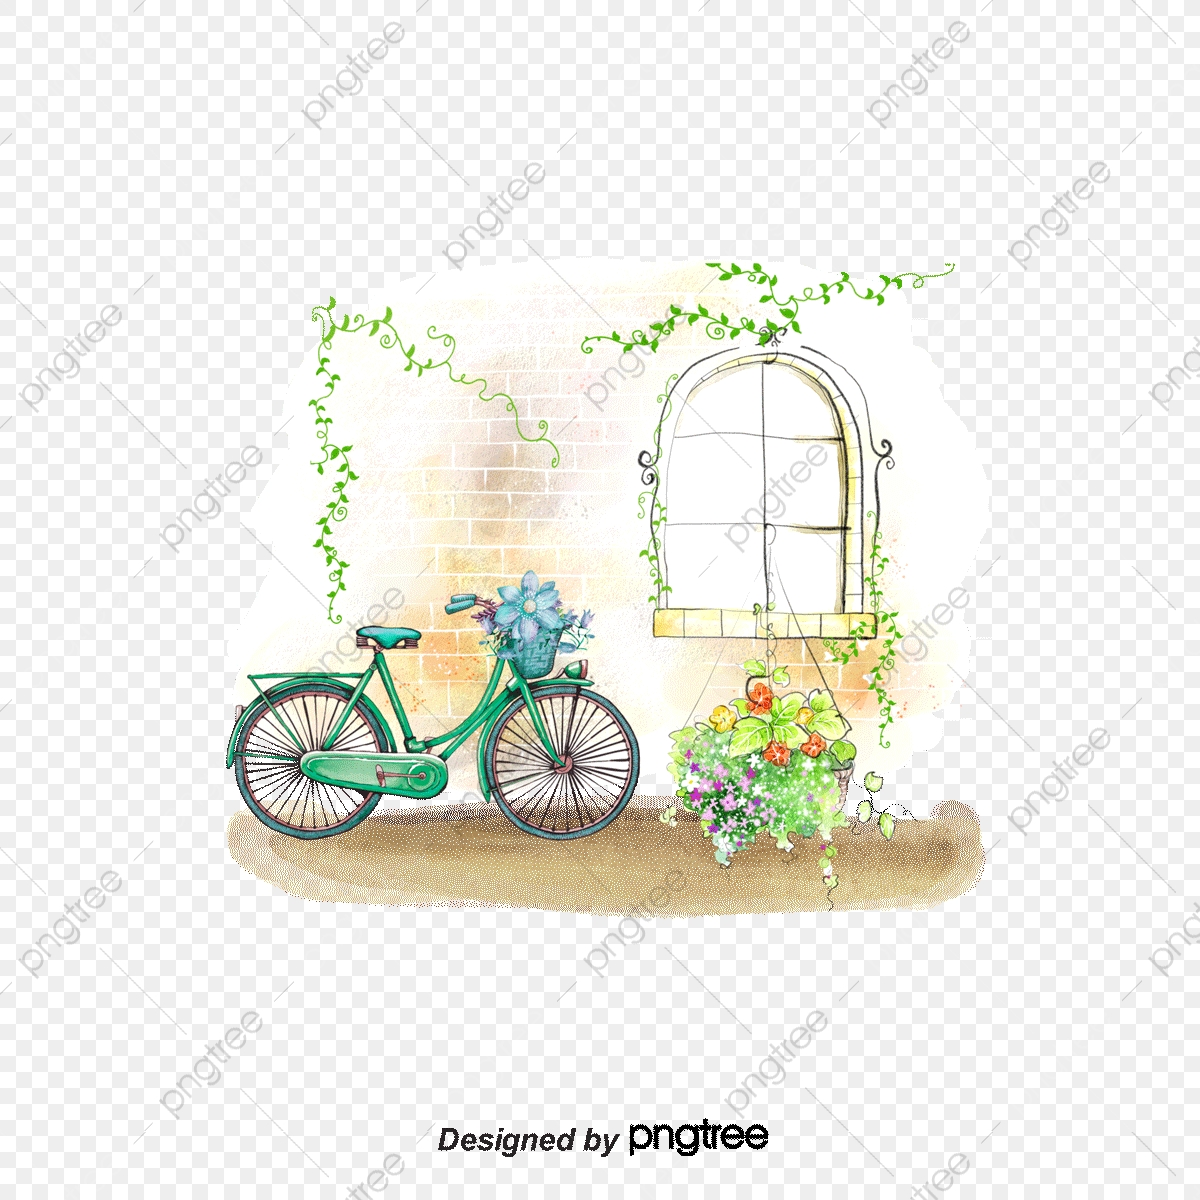 Bicicleta Y Ventanas Paisaje Acuarela Pintura De Paisaje Paisaje De Dibujos Animados Png Y Psd Para Descargar Gratis Pngtree